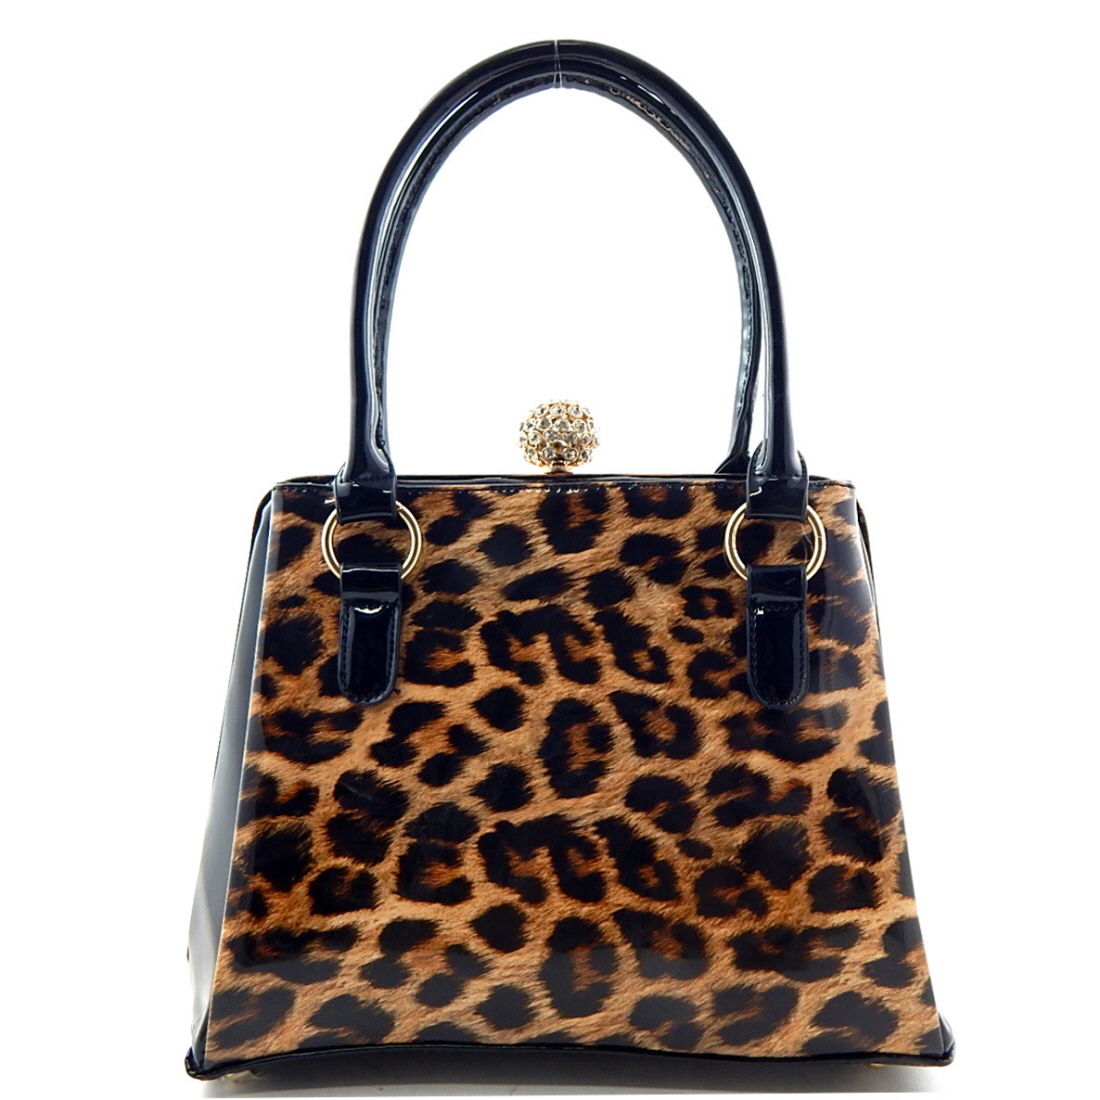 Fashion with Leopard print Handbag - Animal Print